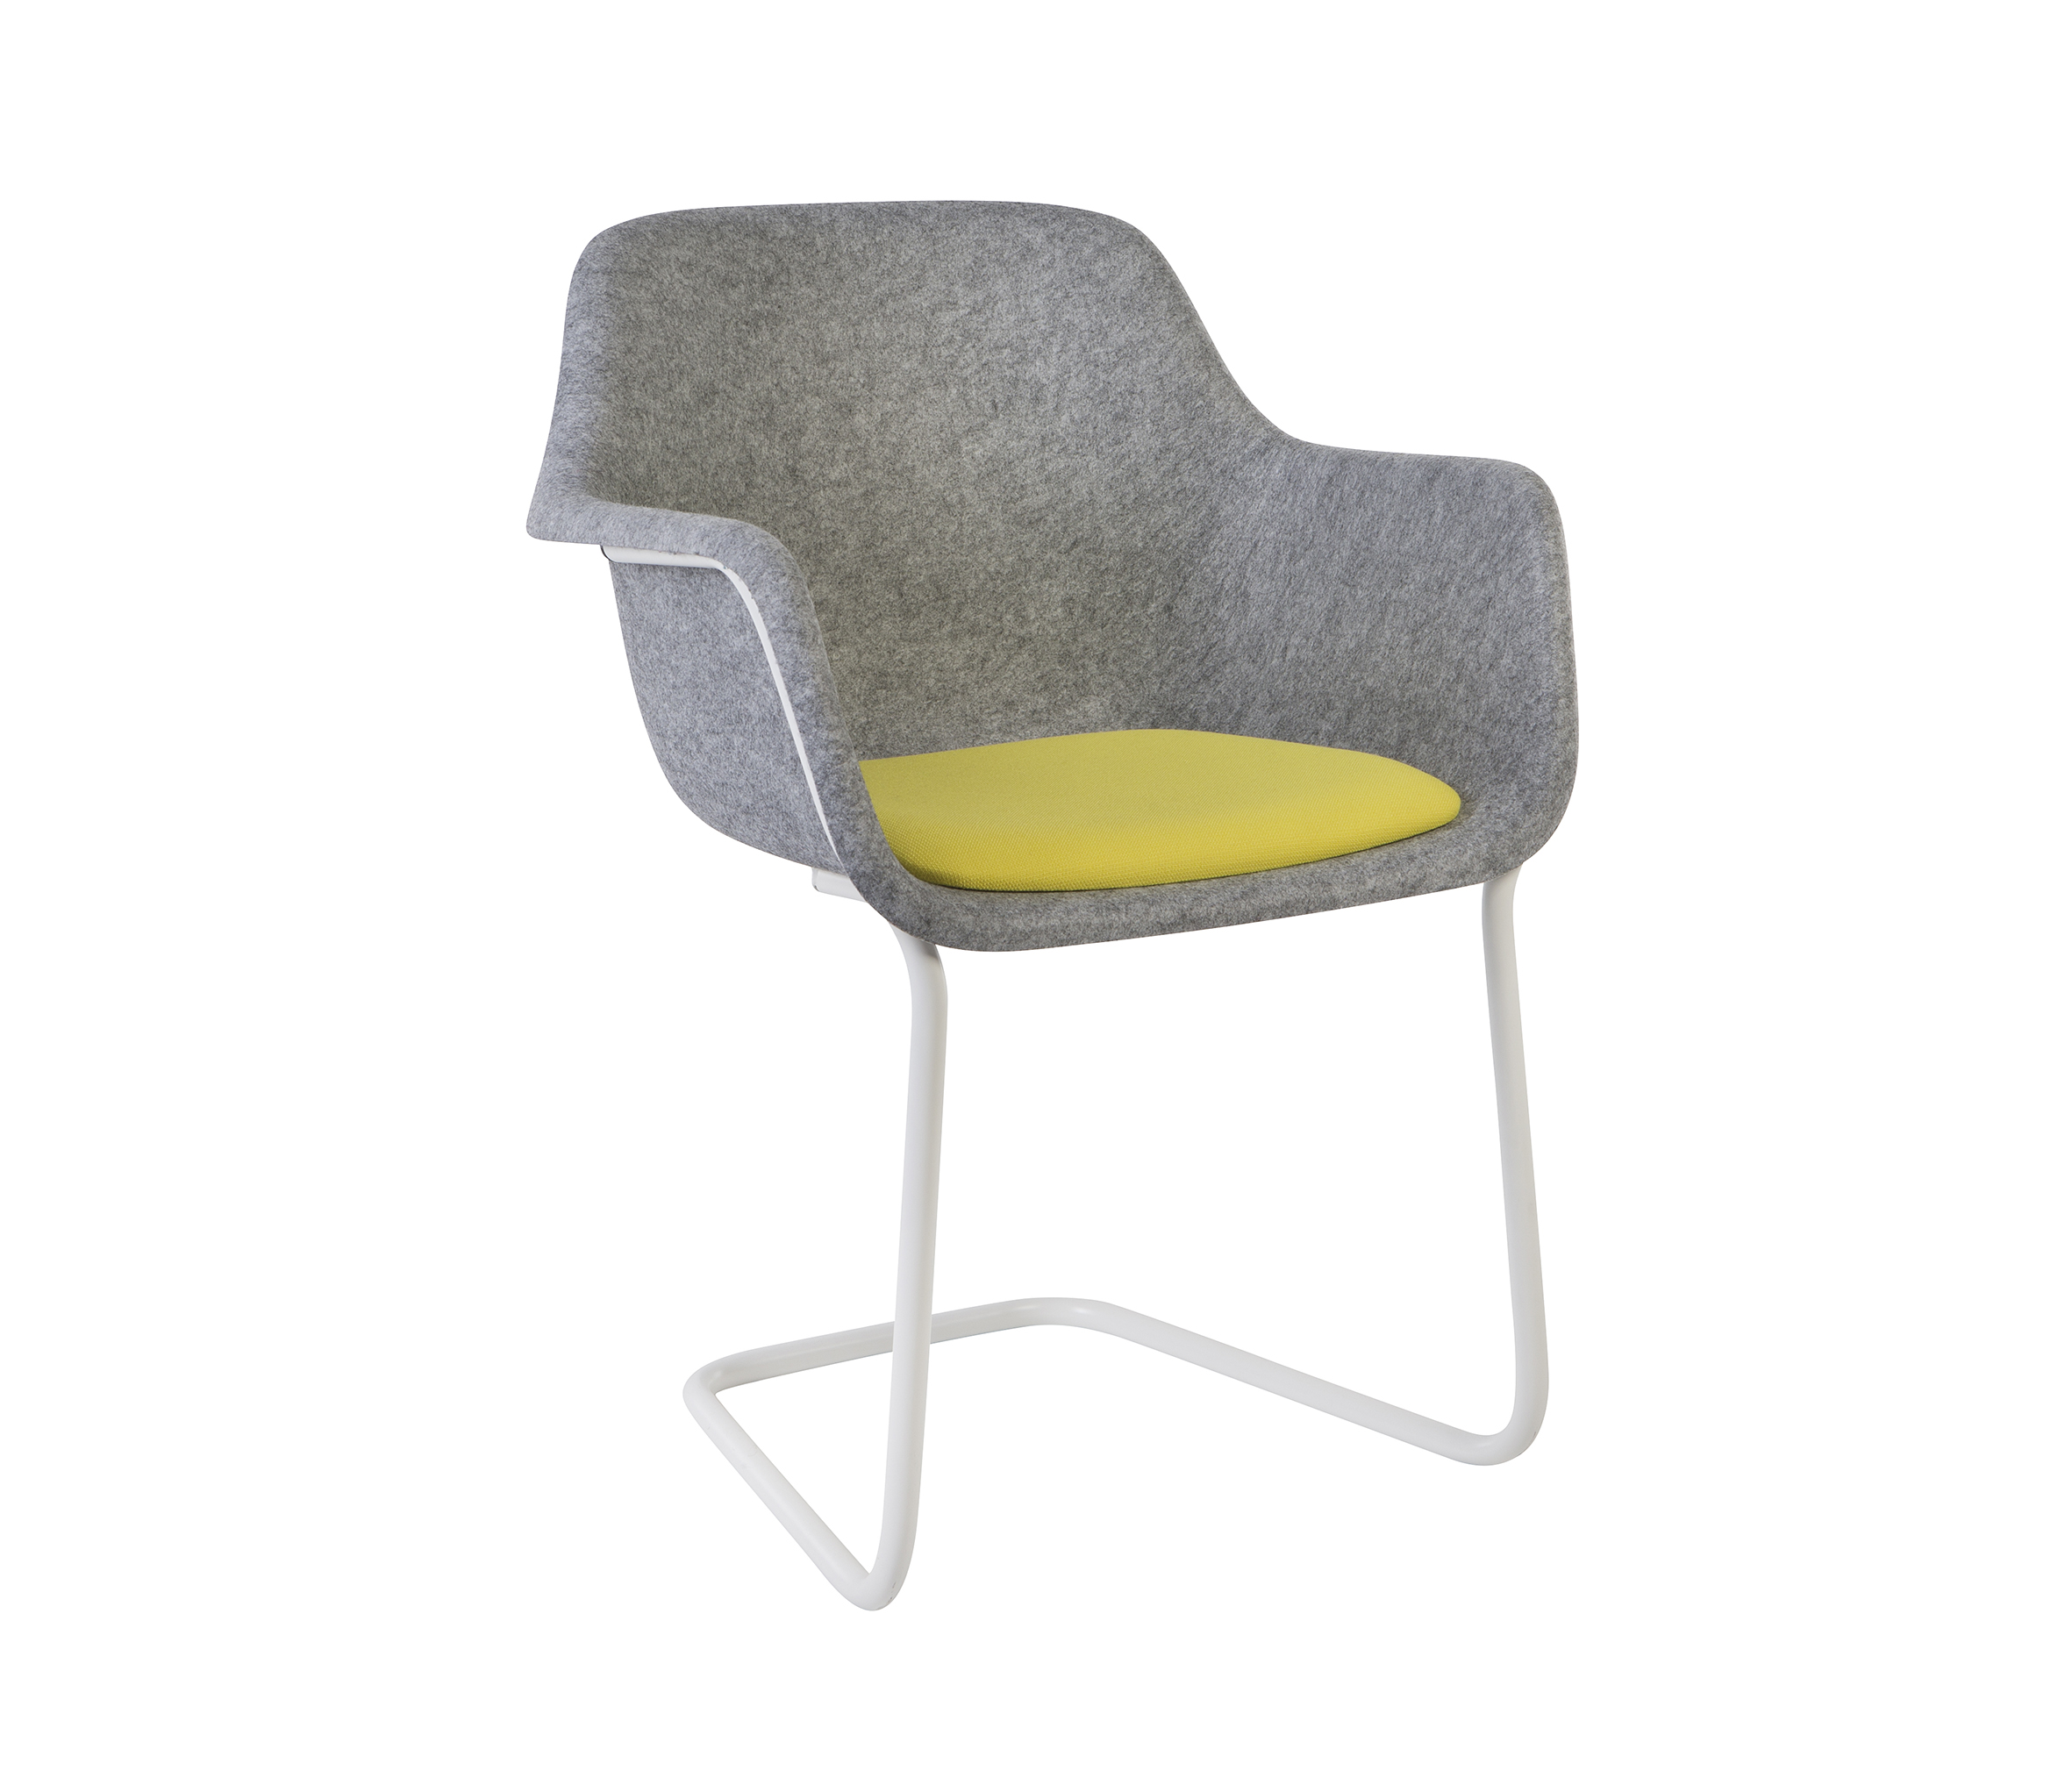 Moka yellow chair